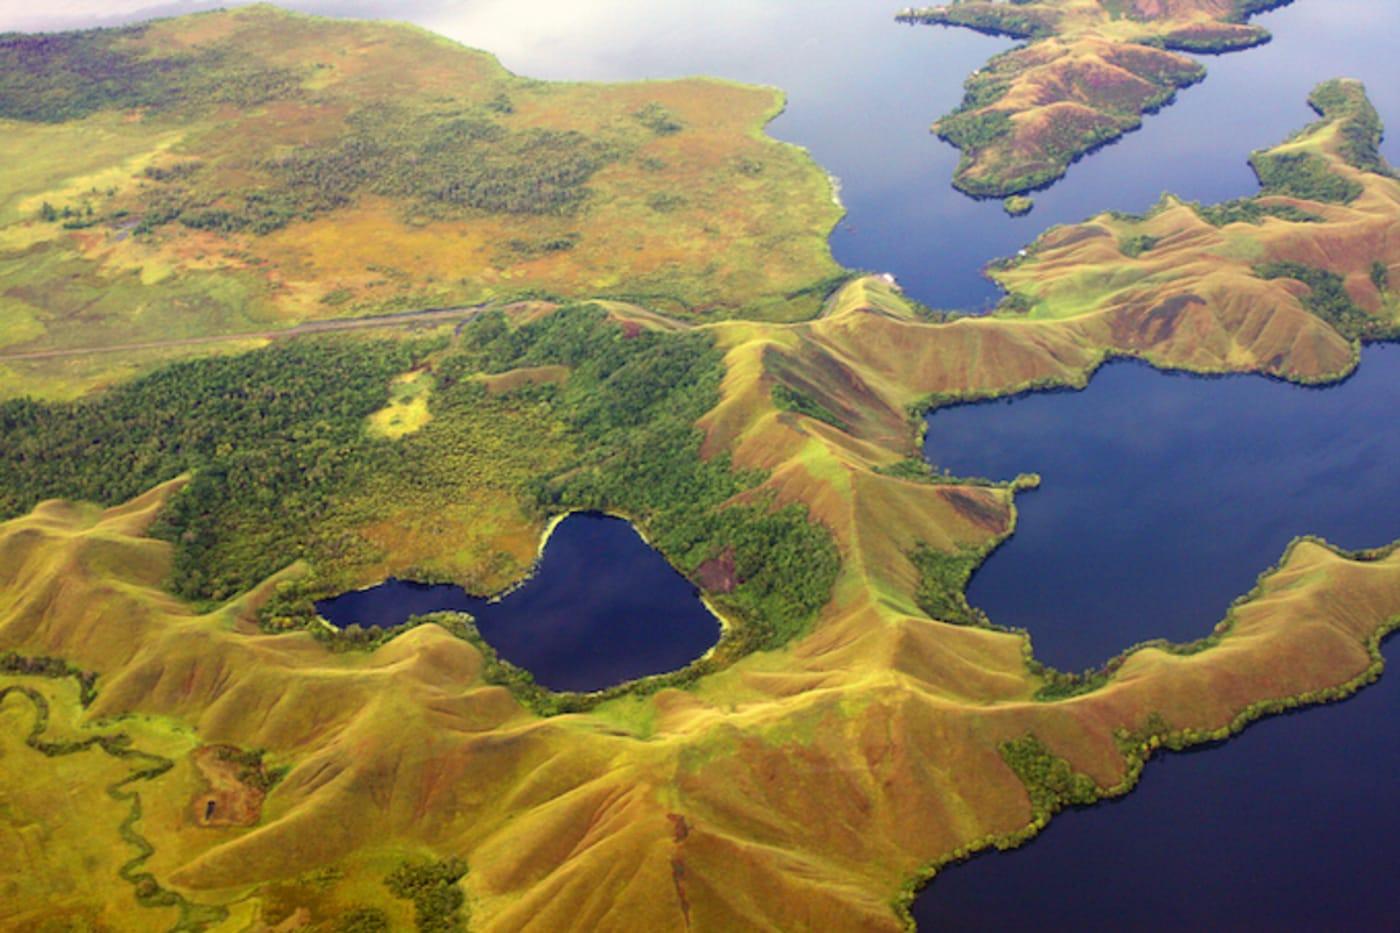 Aerial view of portion of Lake Sentani.